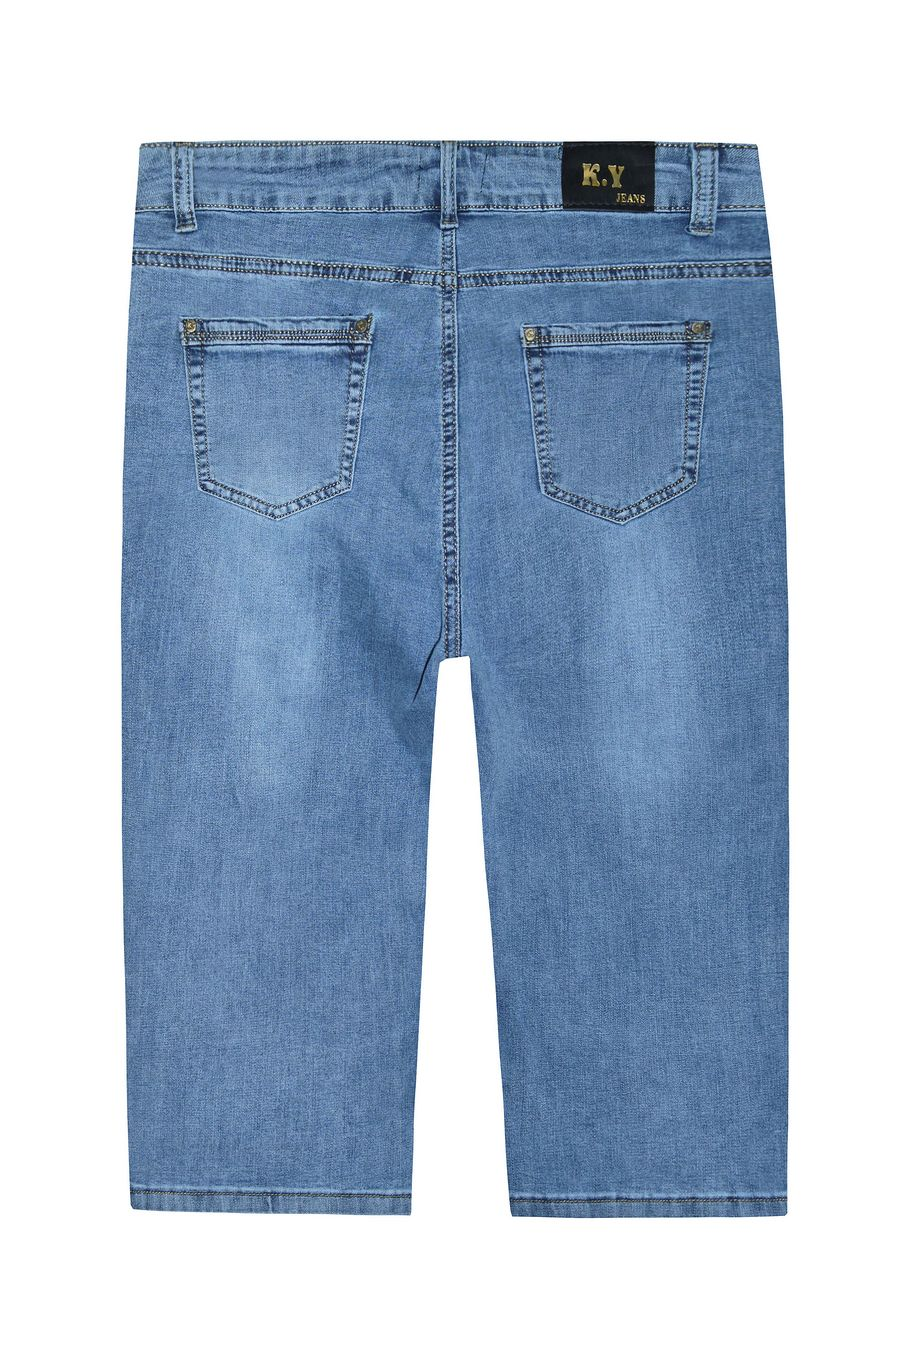 Бриджи женские K.Y Jeans LС429 - фото 2